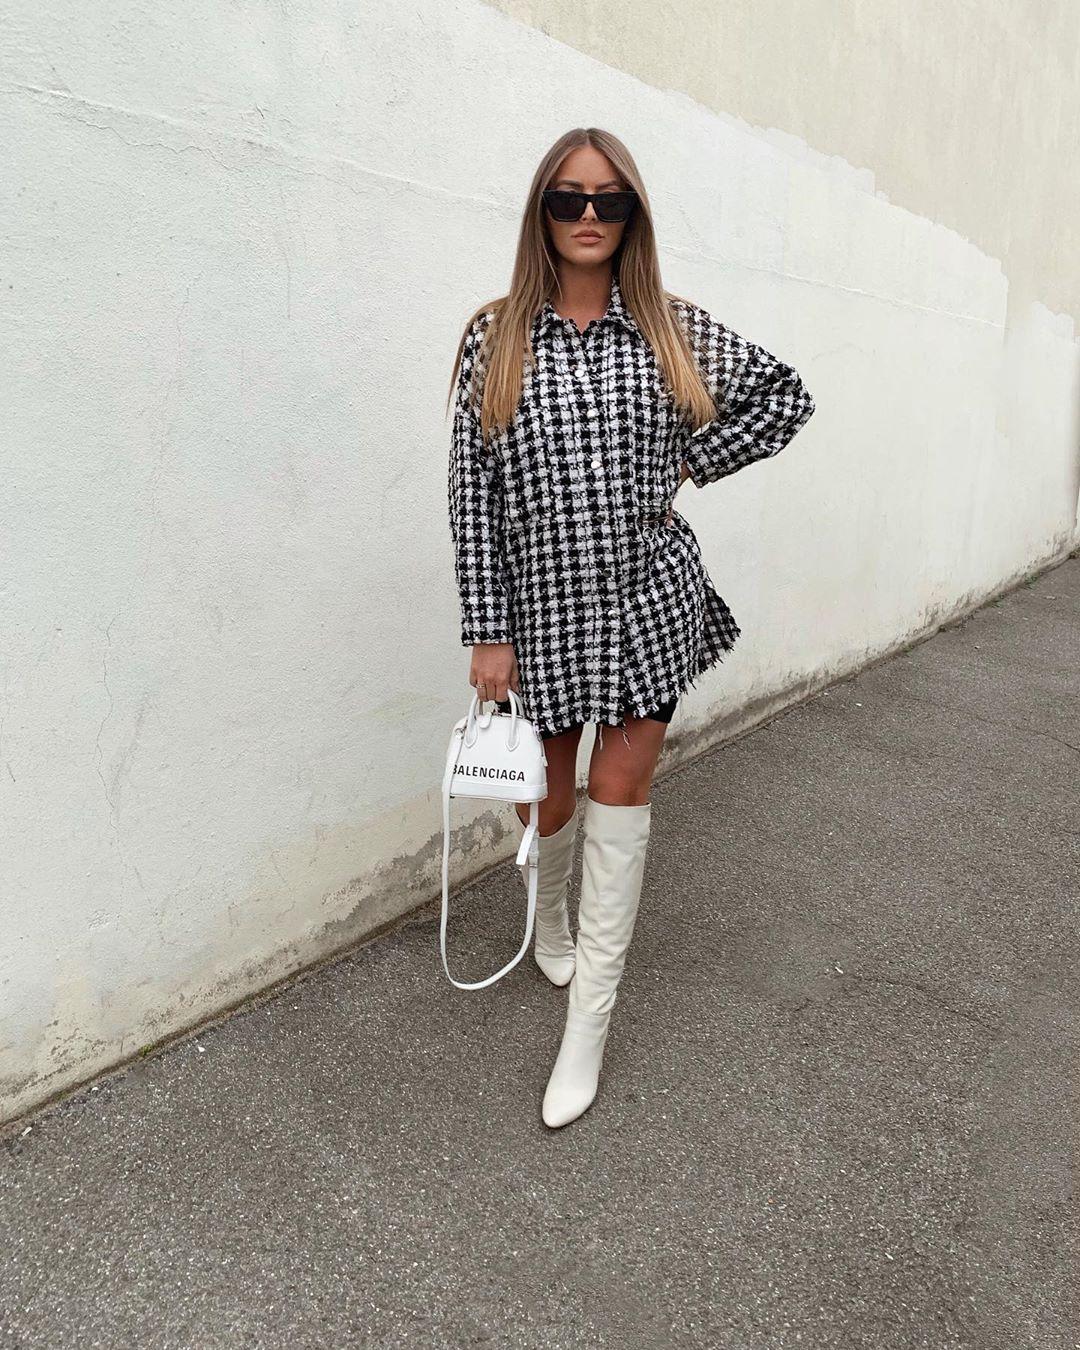 high heeled leather knee high boots de Zara sur pauline_cassie